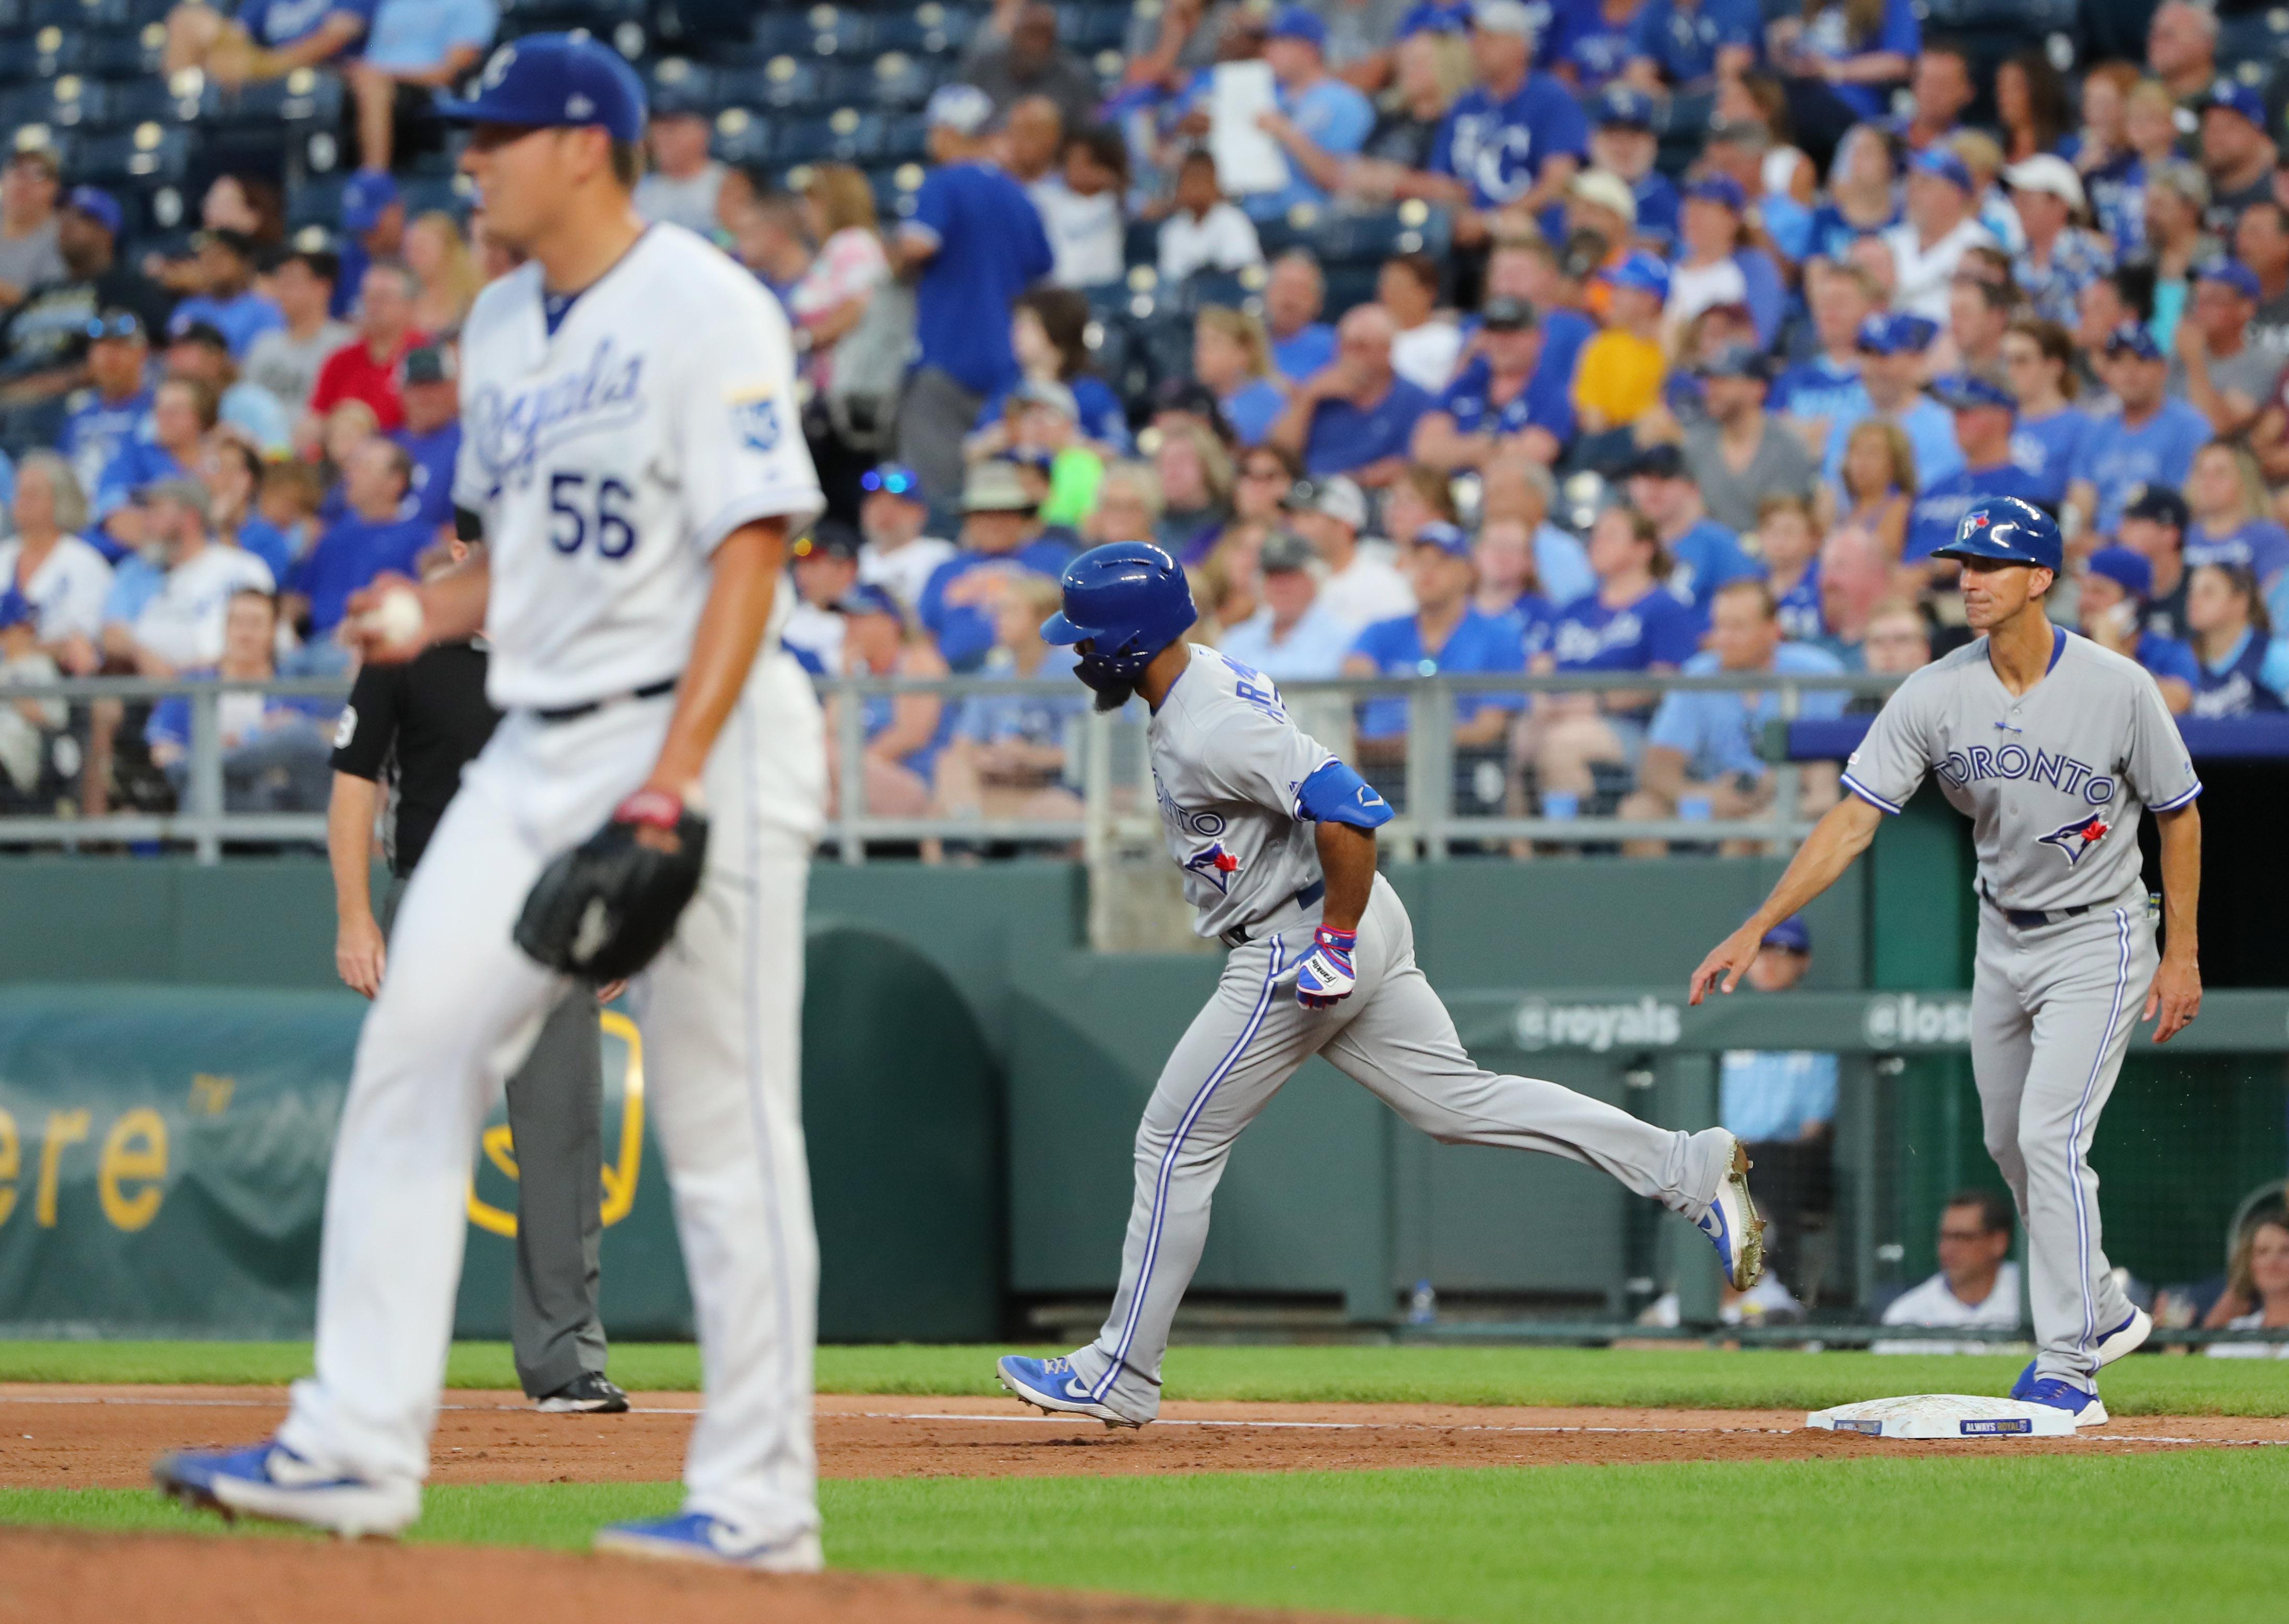 Toronto Blue Jays center fielder Teoscar Hernandez (37) rounds the bases after hitting a home run off of Kansas City Royals starting pitcher Brad Keller (56) during the fifth inning at Kauffman Stadium.